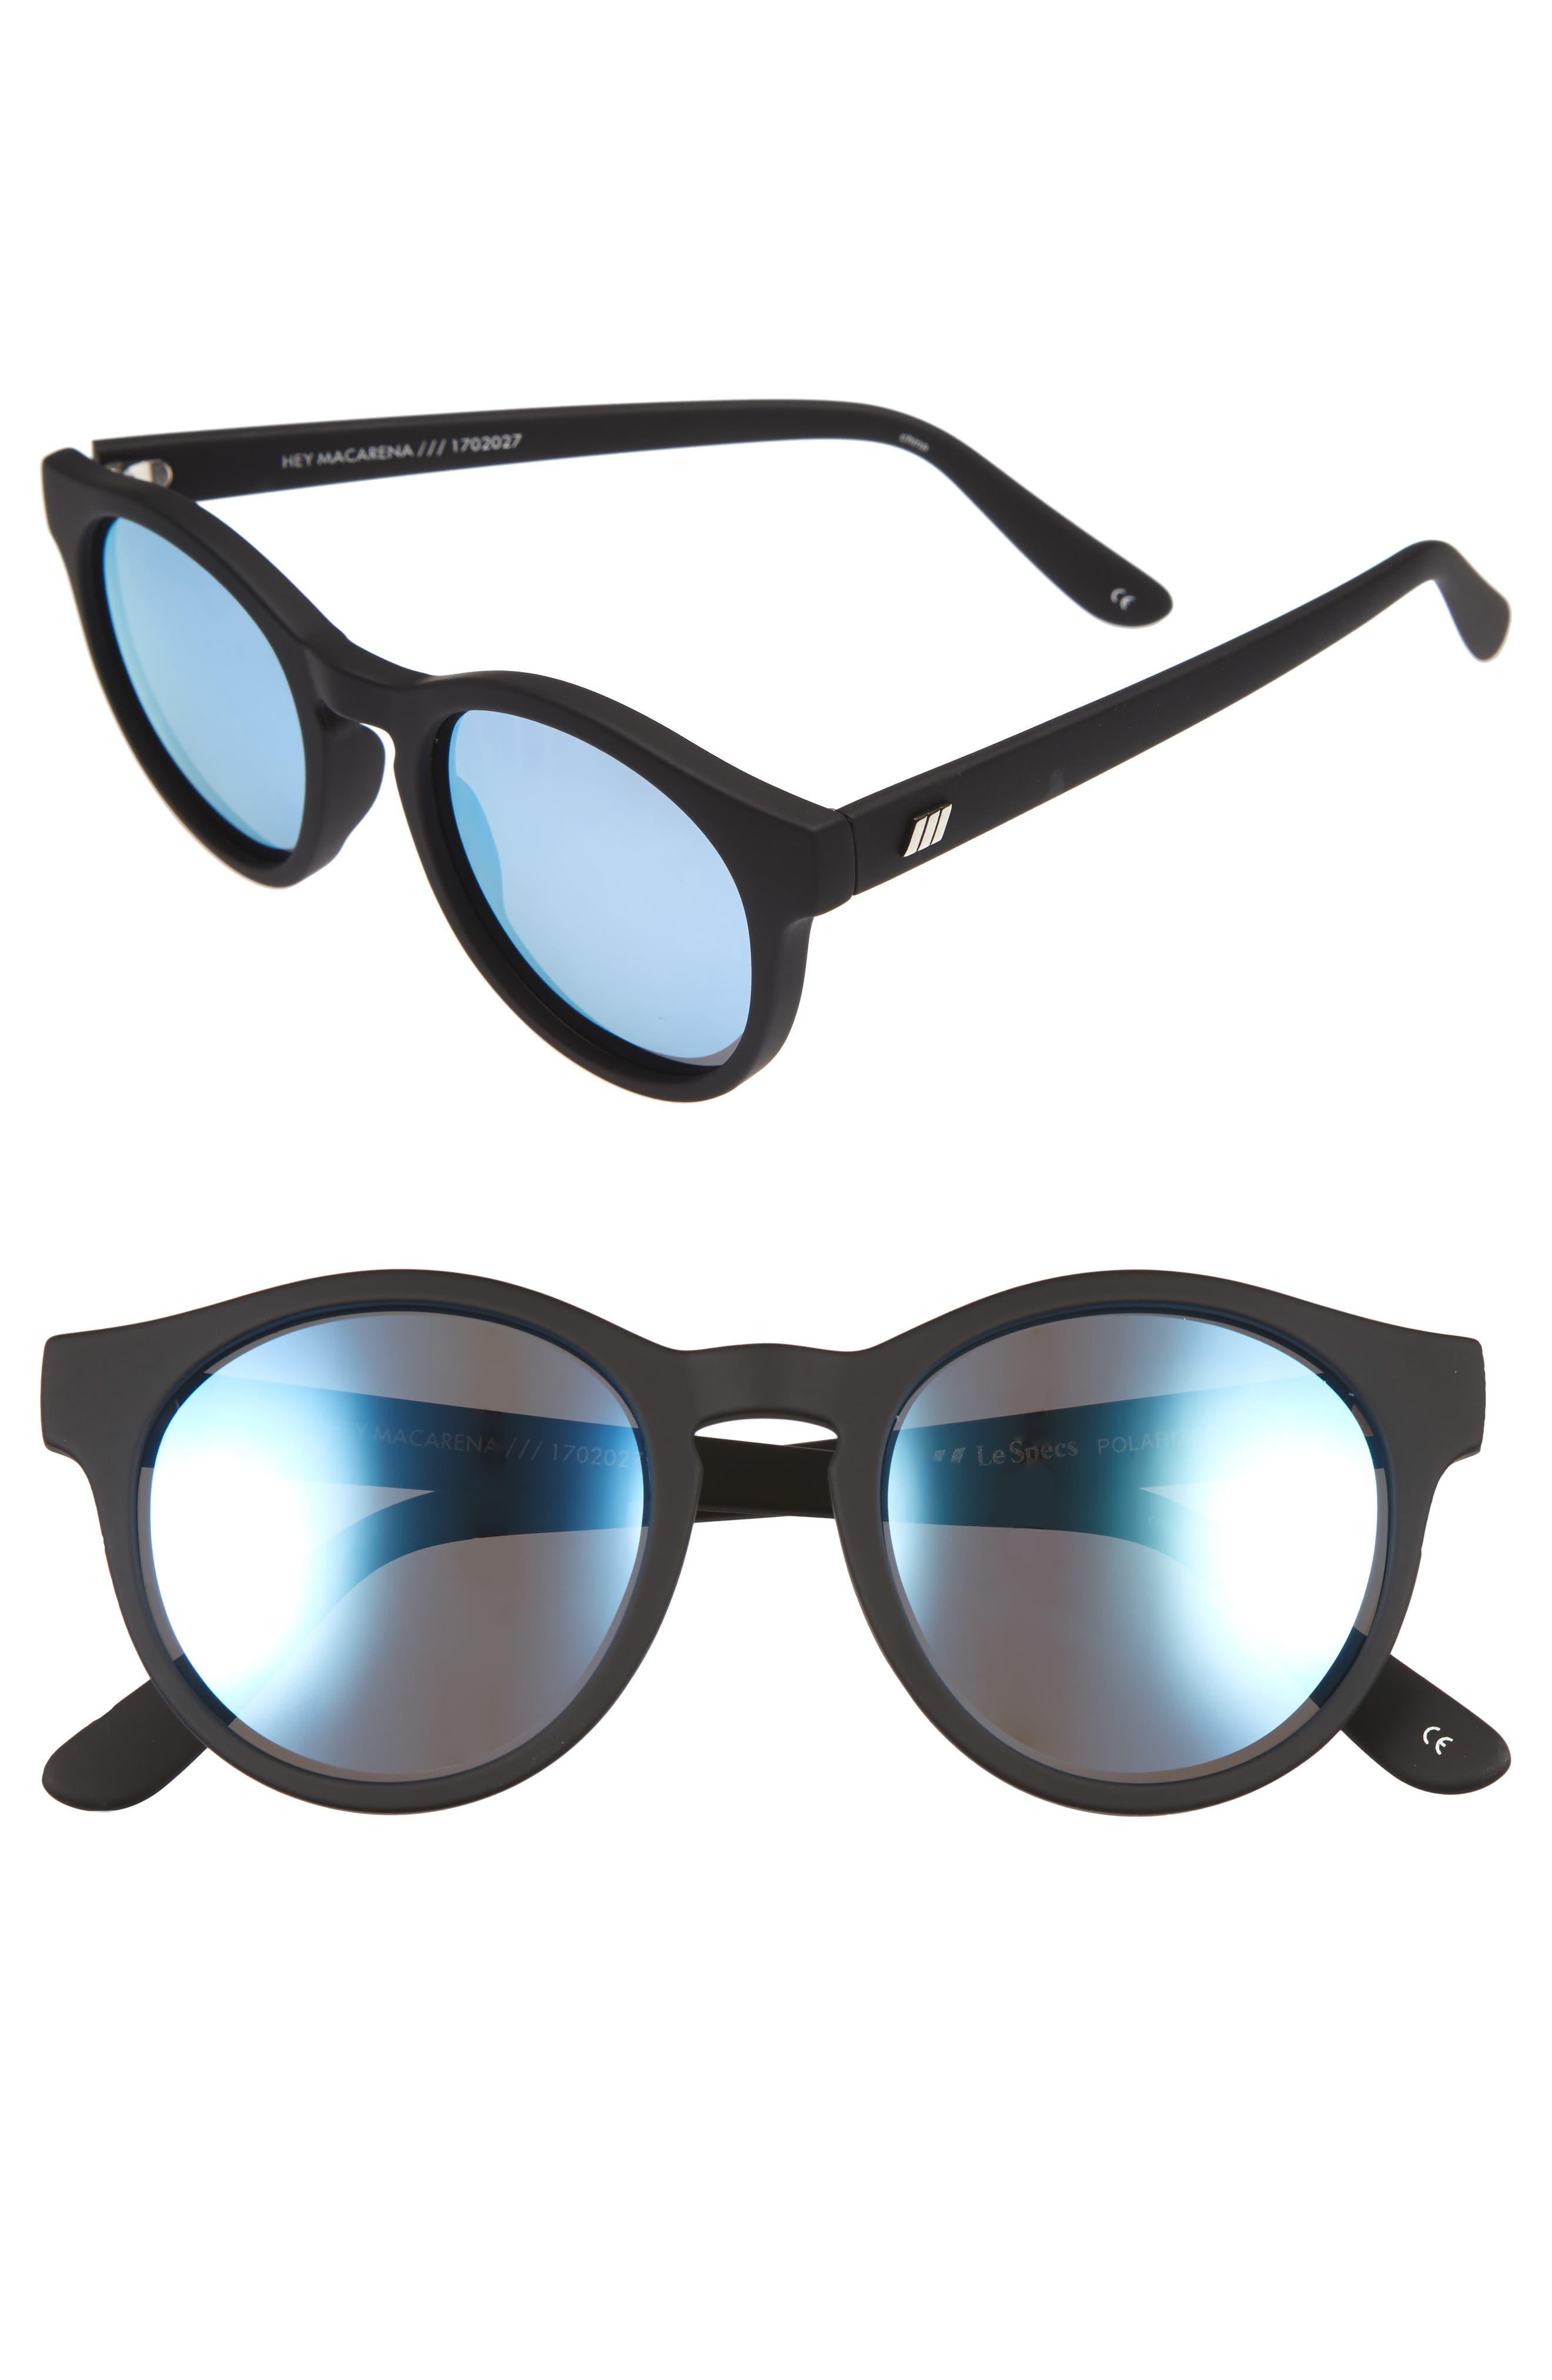 Le Specs Hey Macarena 51mm Polarized Retro Sunglasses